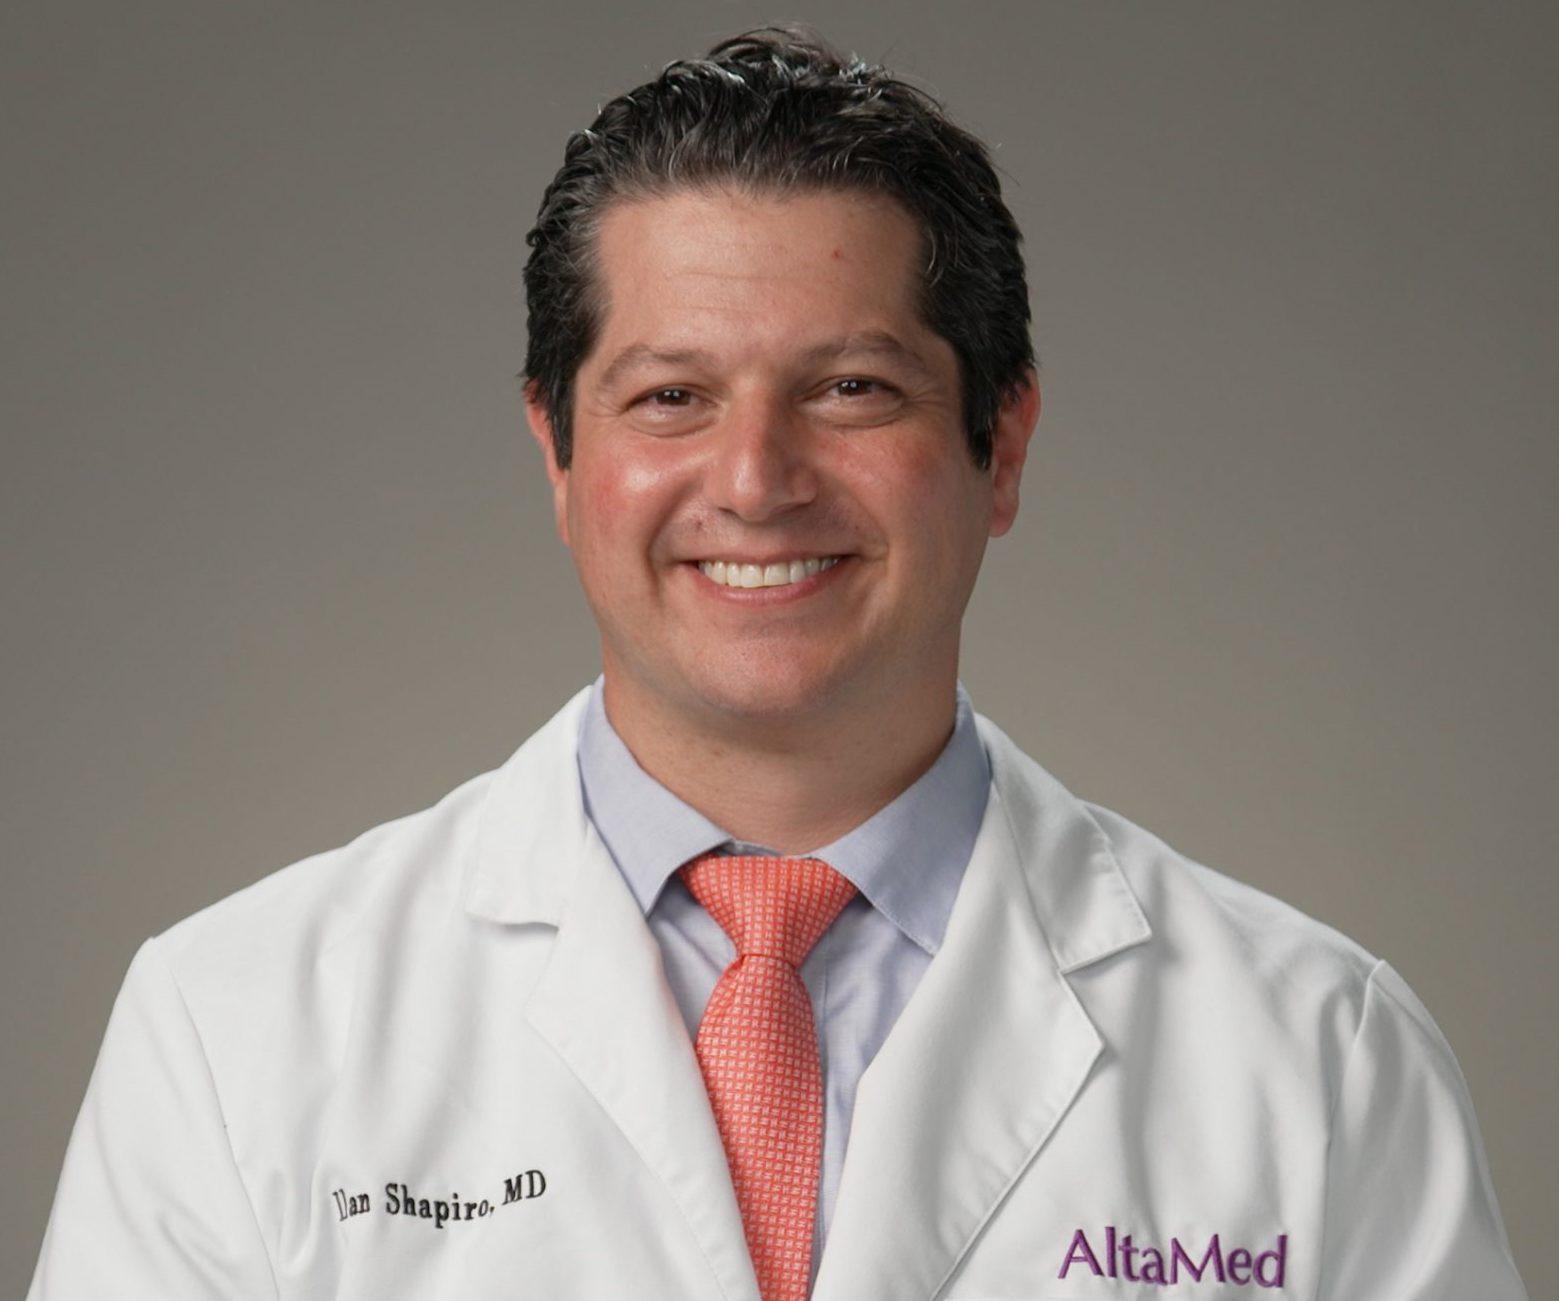 Dr. Ilan Shapiro: Providing Culturally Sensitive Care